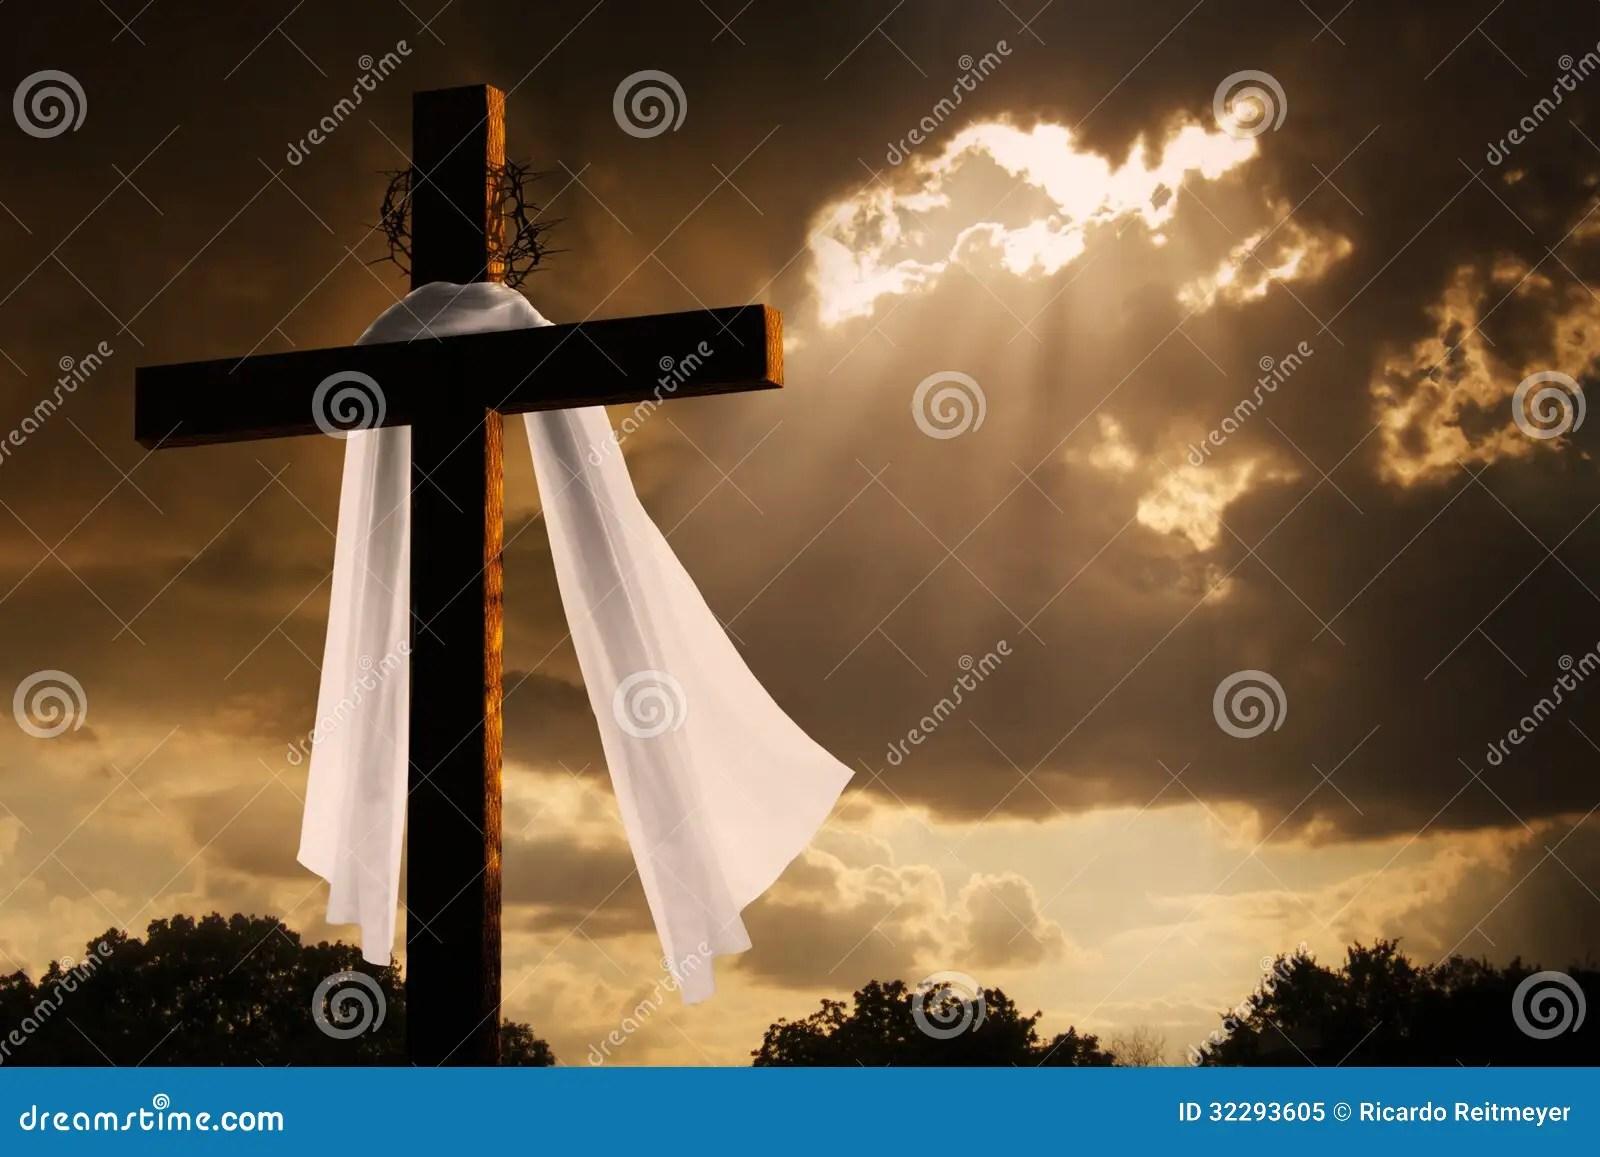 dramatic lighting on christian